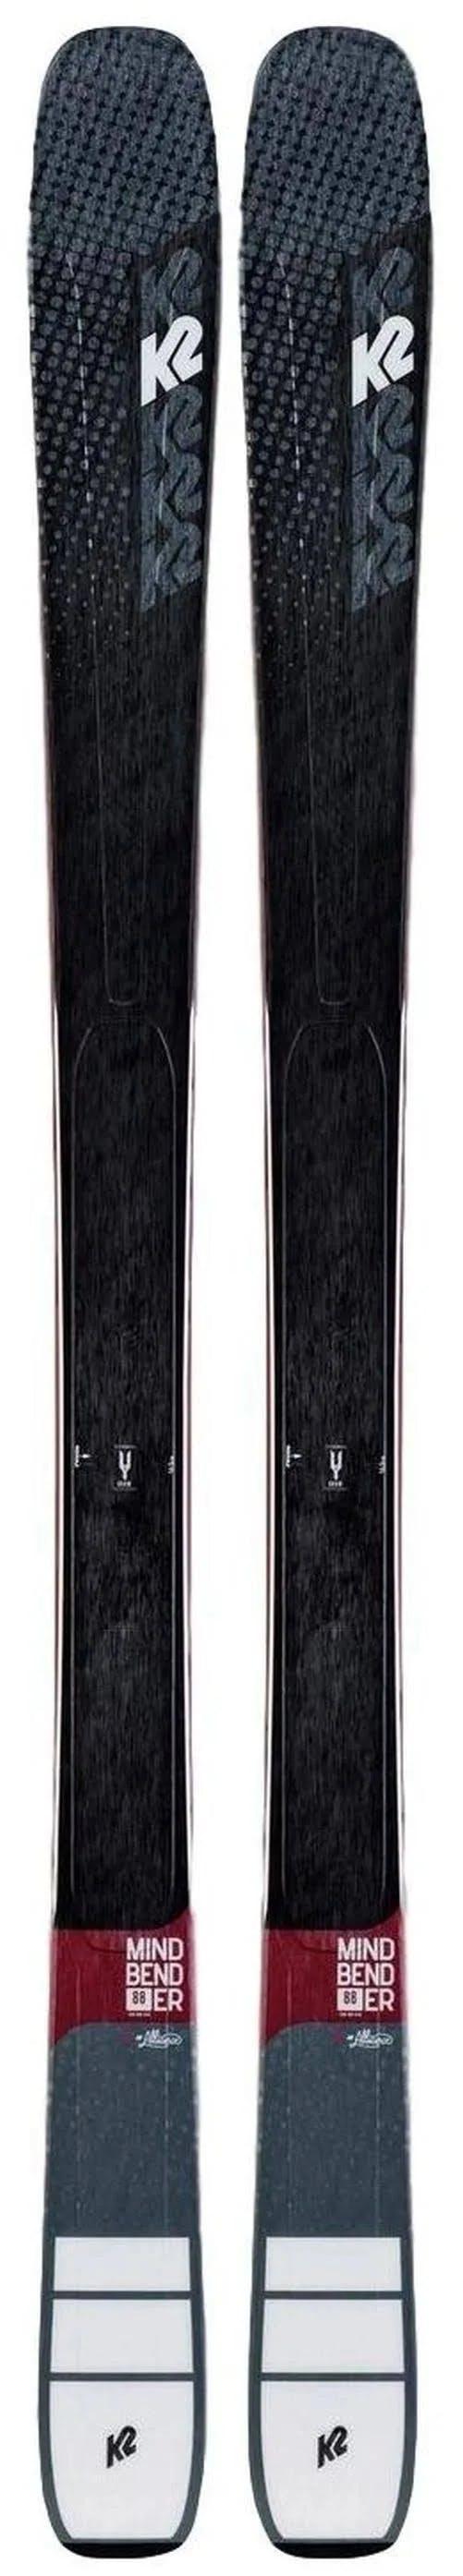 K2 Mindbender 88 TI Alliance Skis · 2020